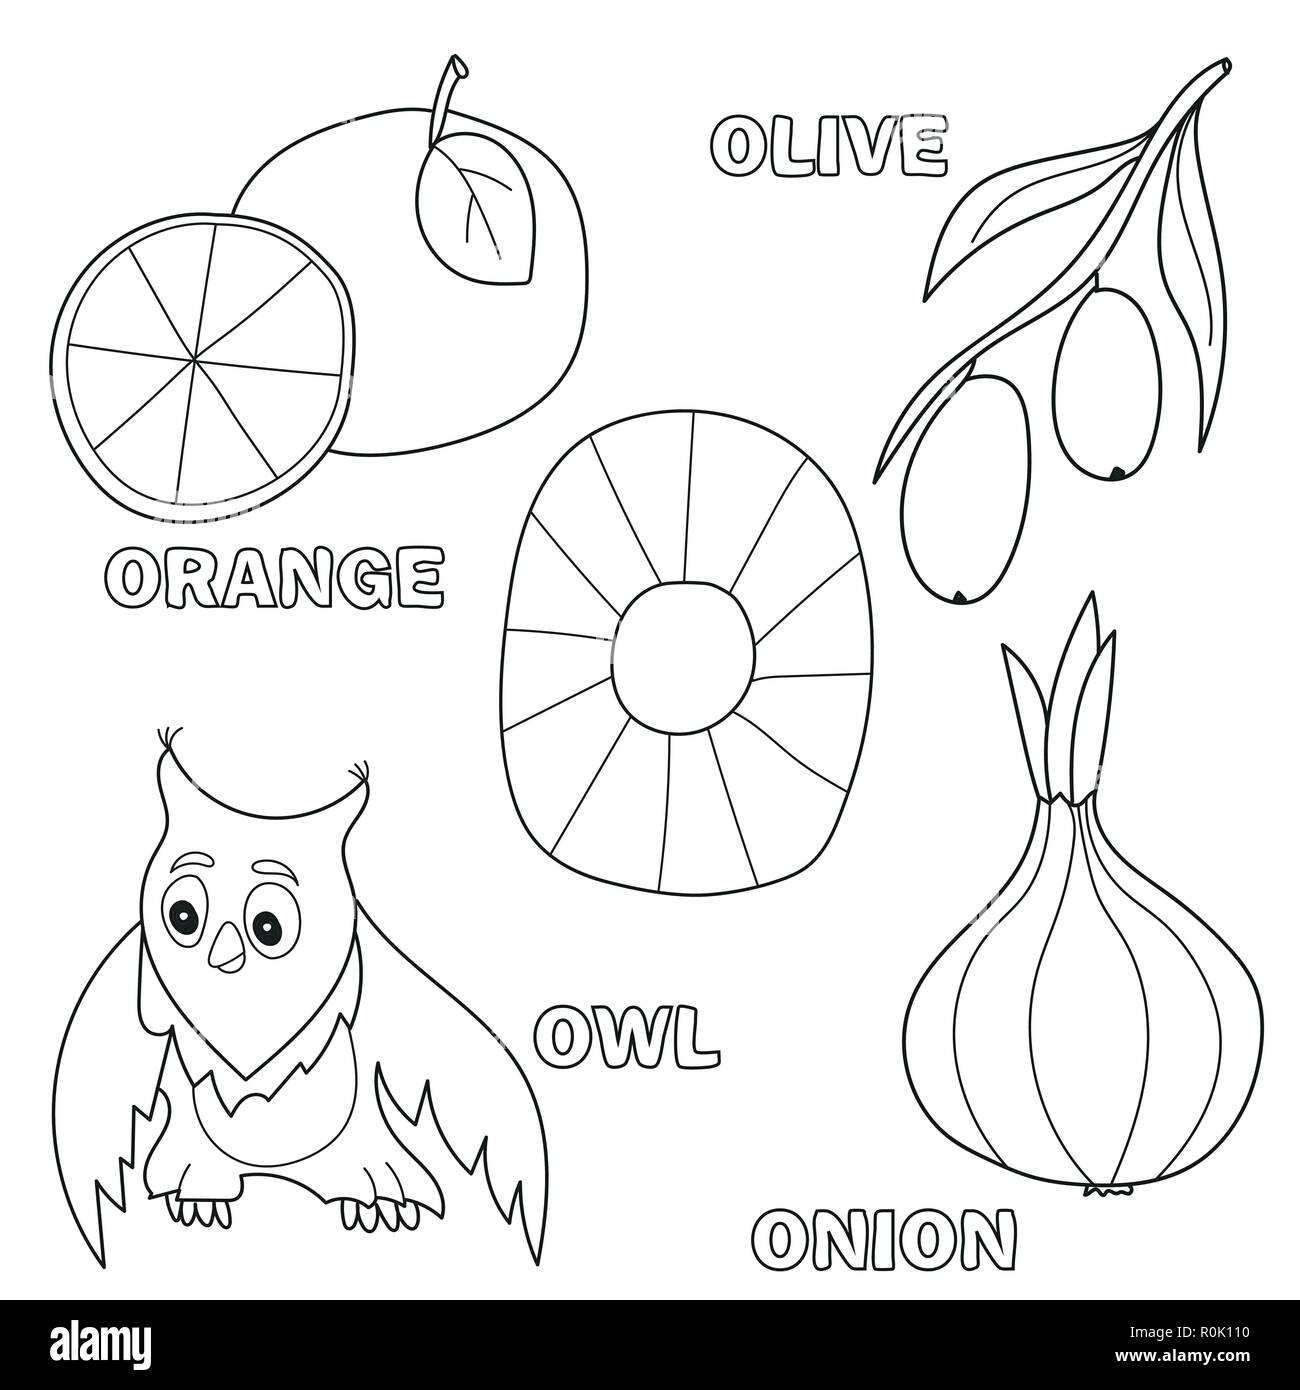 Cartoon Onion Stock Photos Amp Cartoon Onion Stock Images